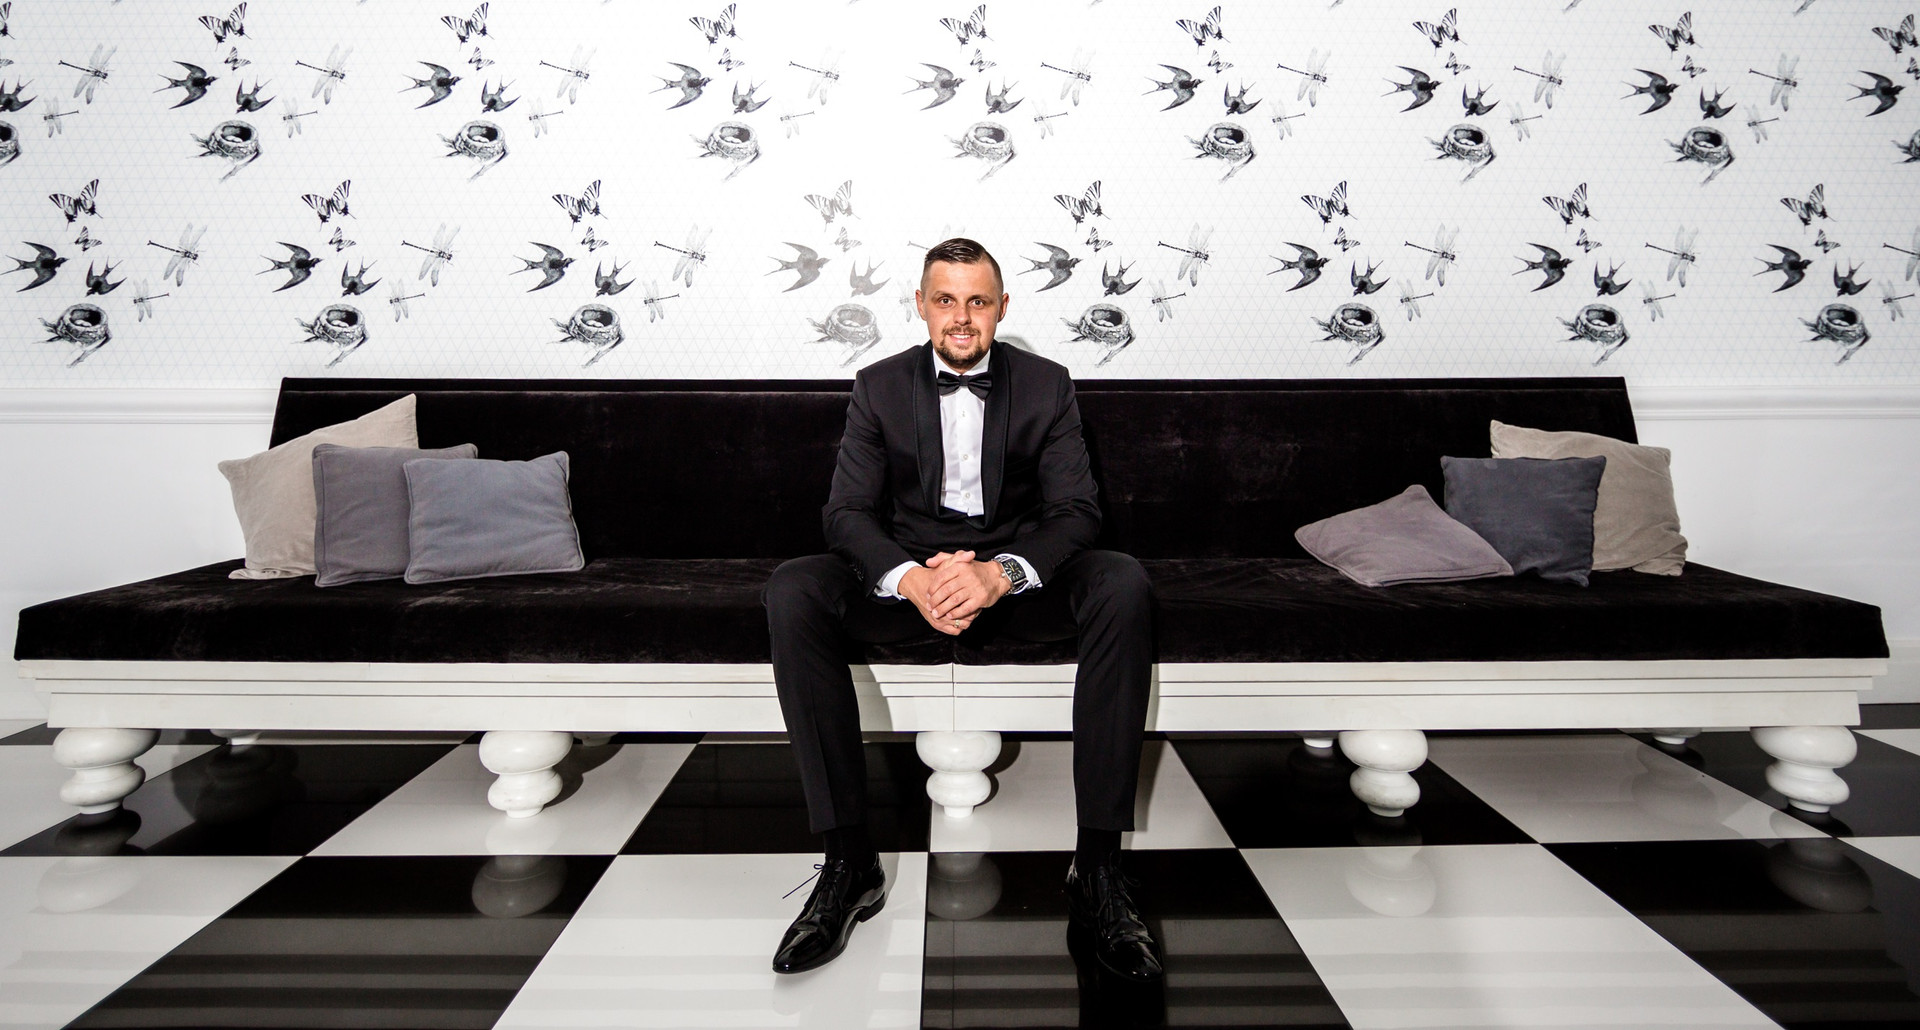 DJ POLSKI Jacek Kowalski